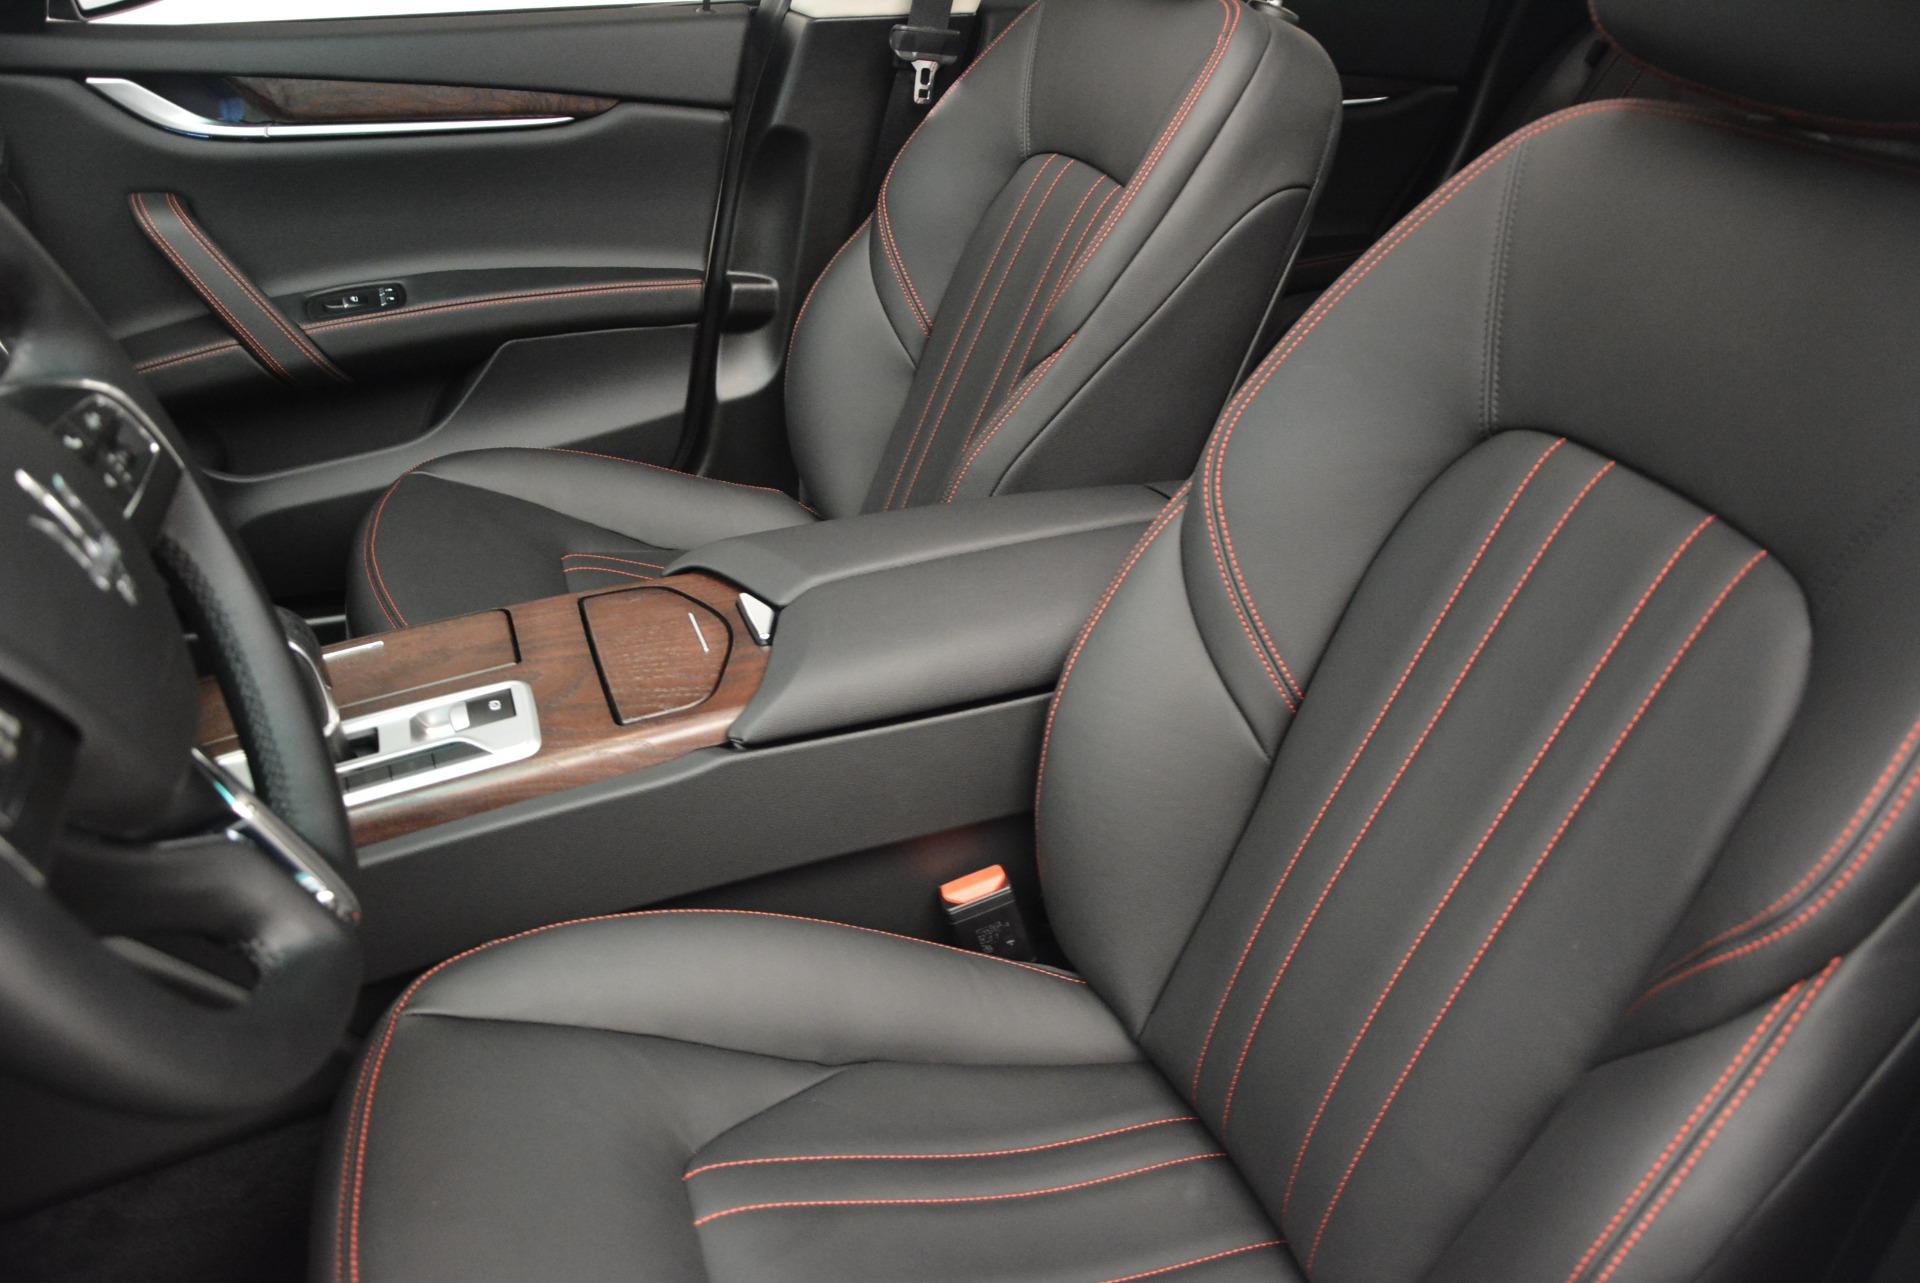 Used 2015 Maserati Ghibli S Q4 For Sale In Greenwich, CT 2070_p14